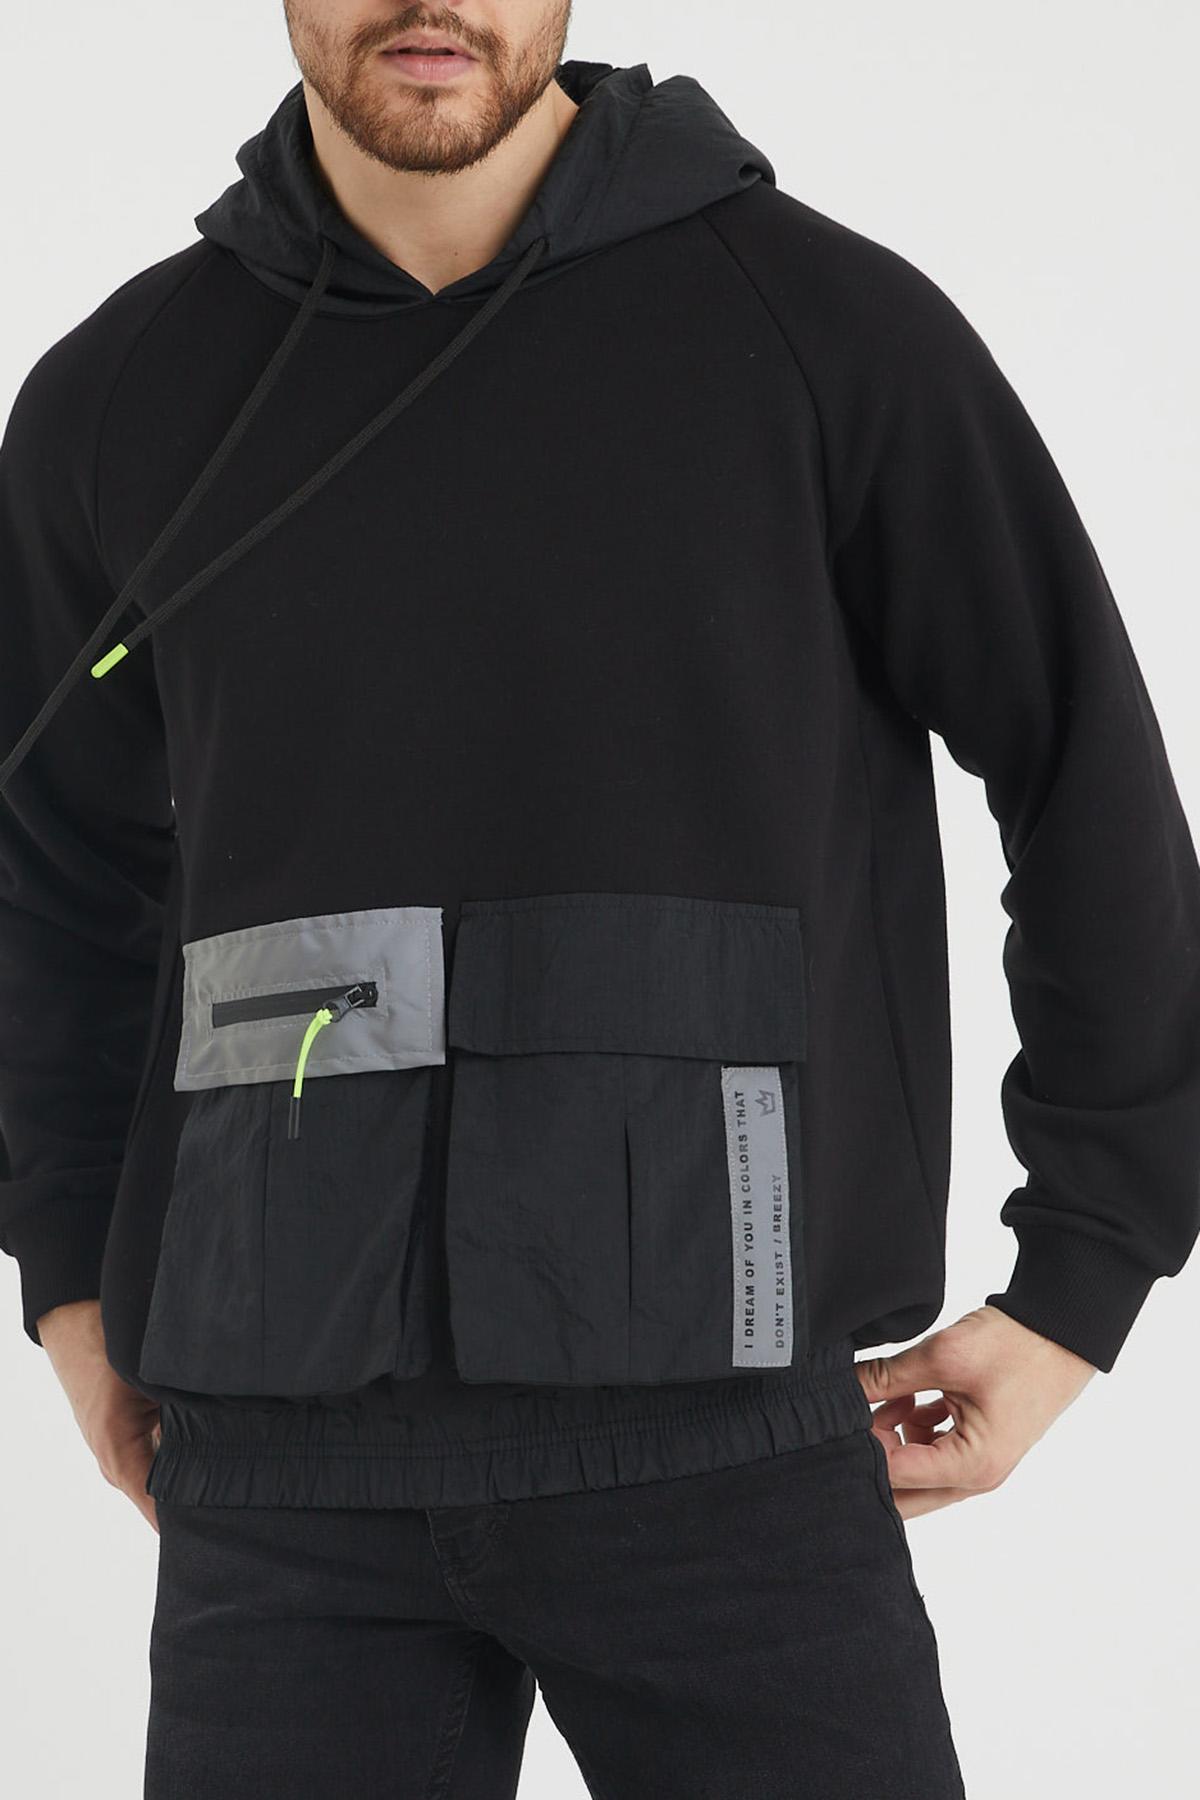 XHAN - Siyah Cep Detaylı Kapüşonlu Sweatshirt 1KXE8-44392-02